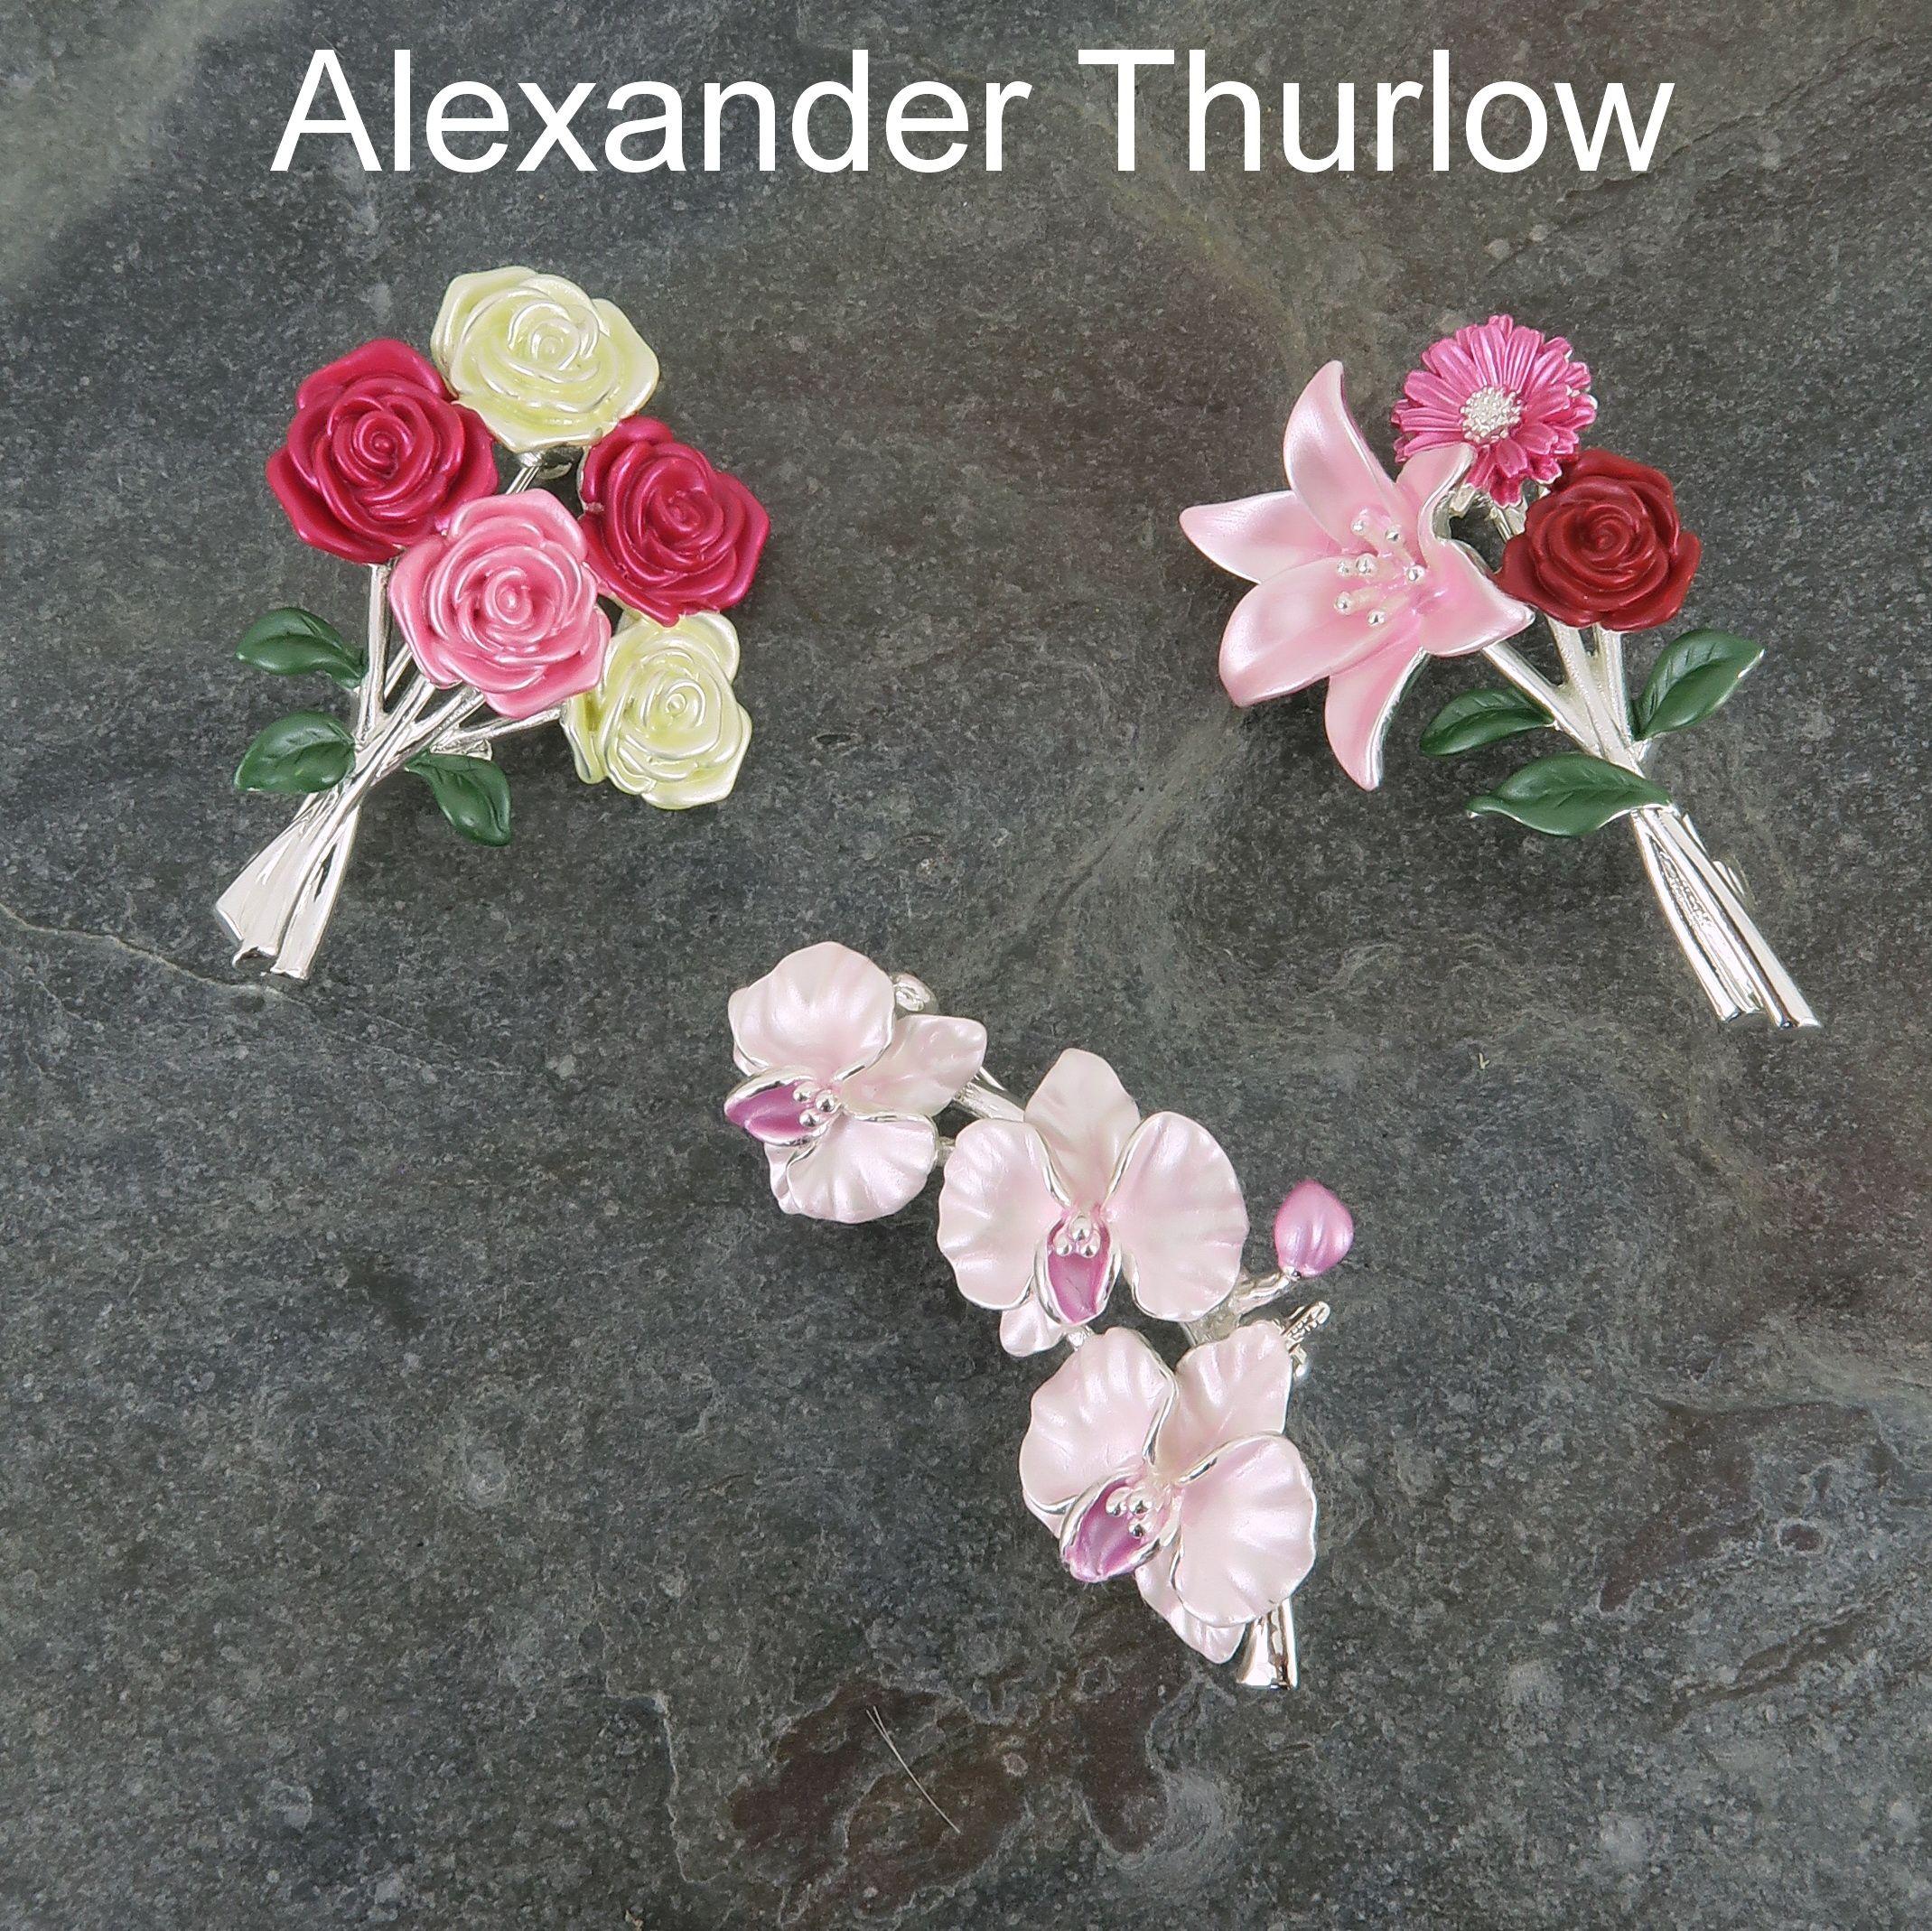 Alexander Thurlow